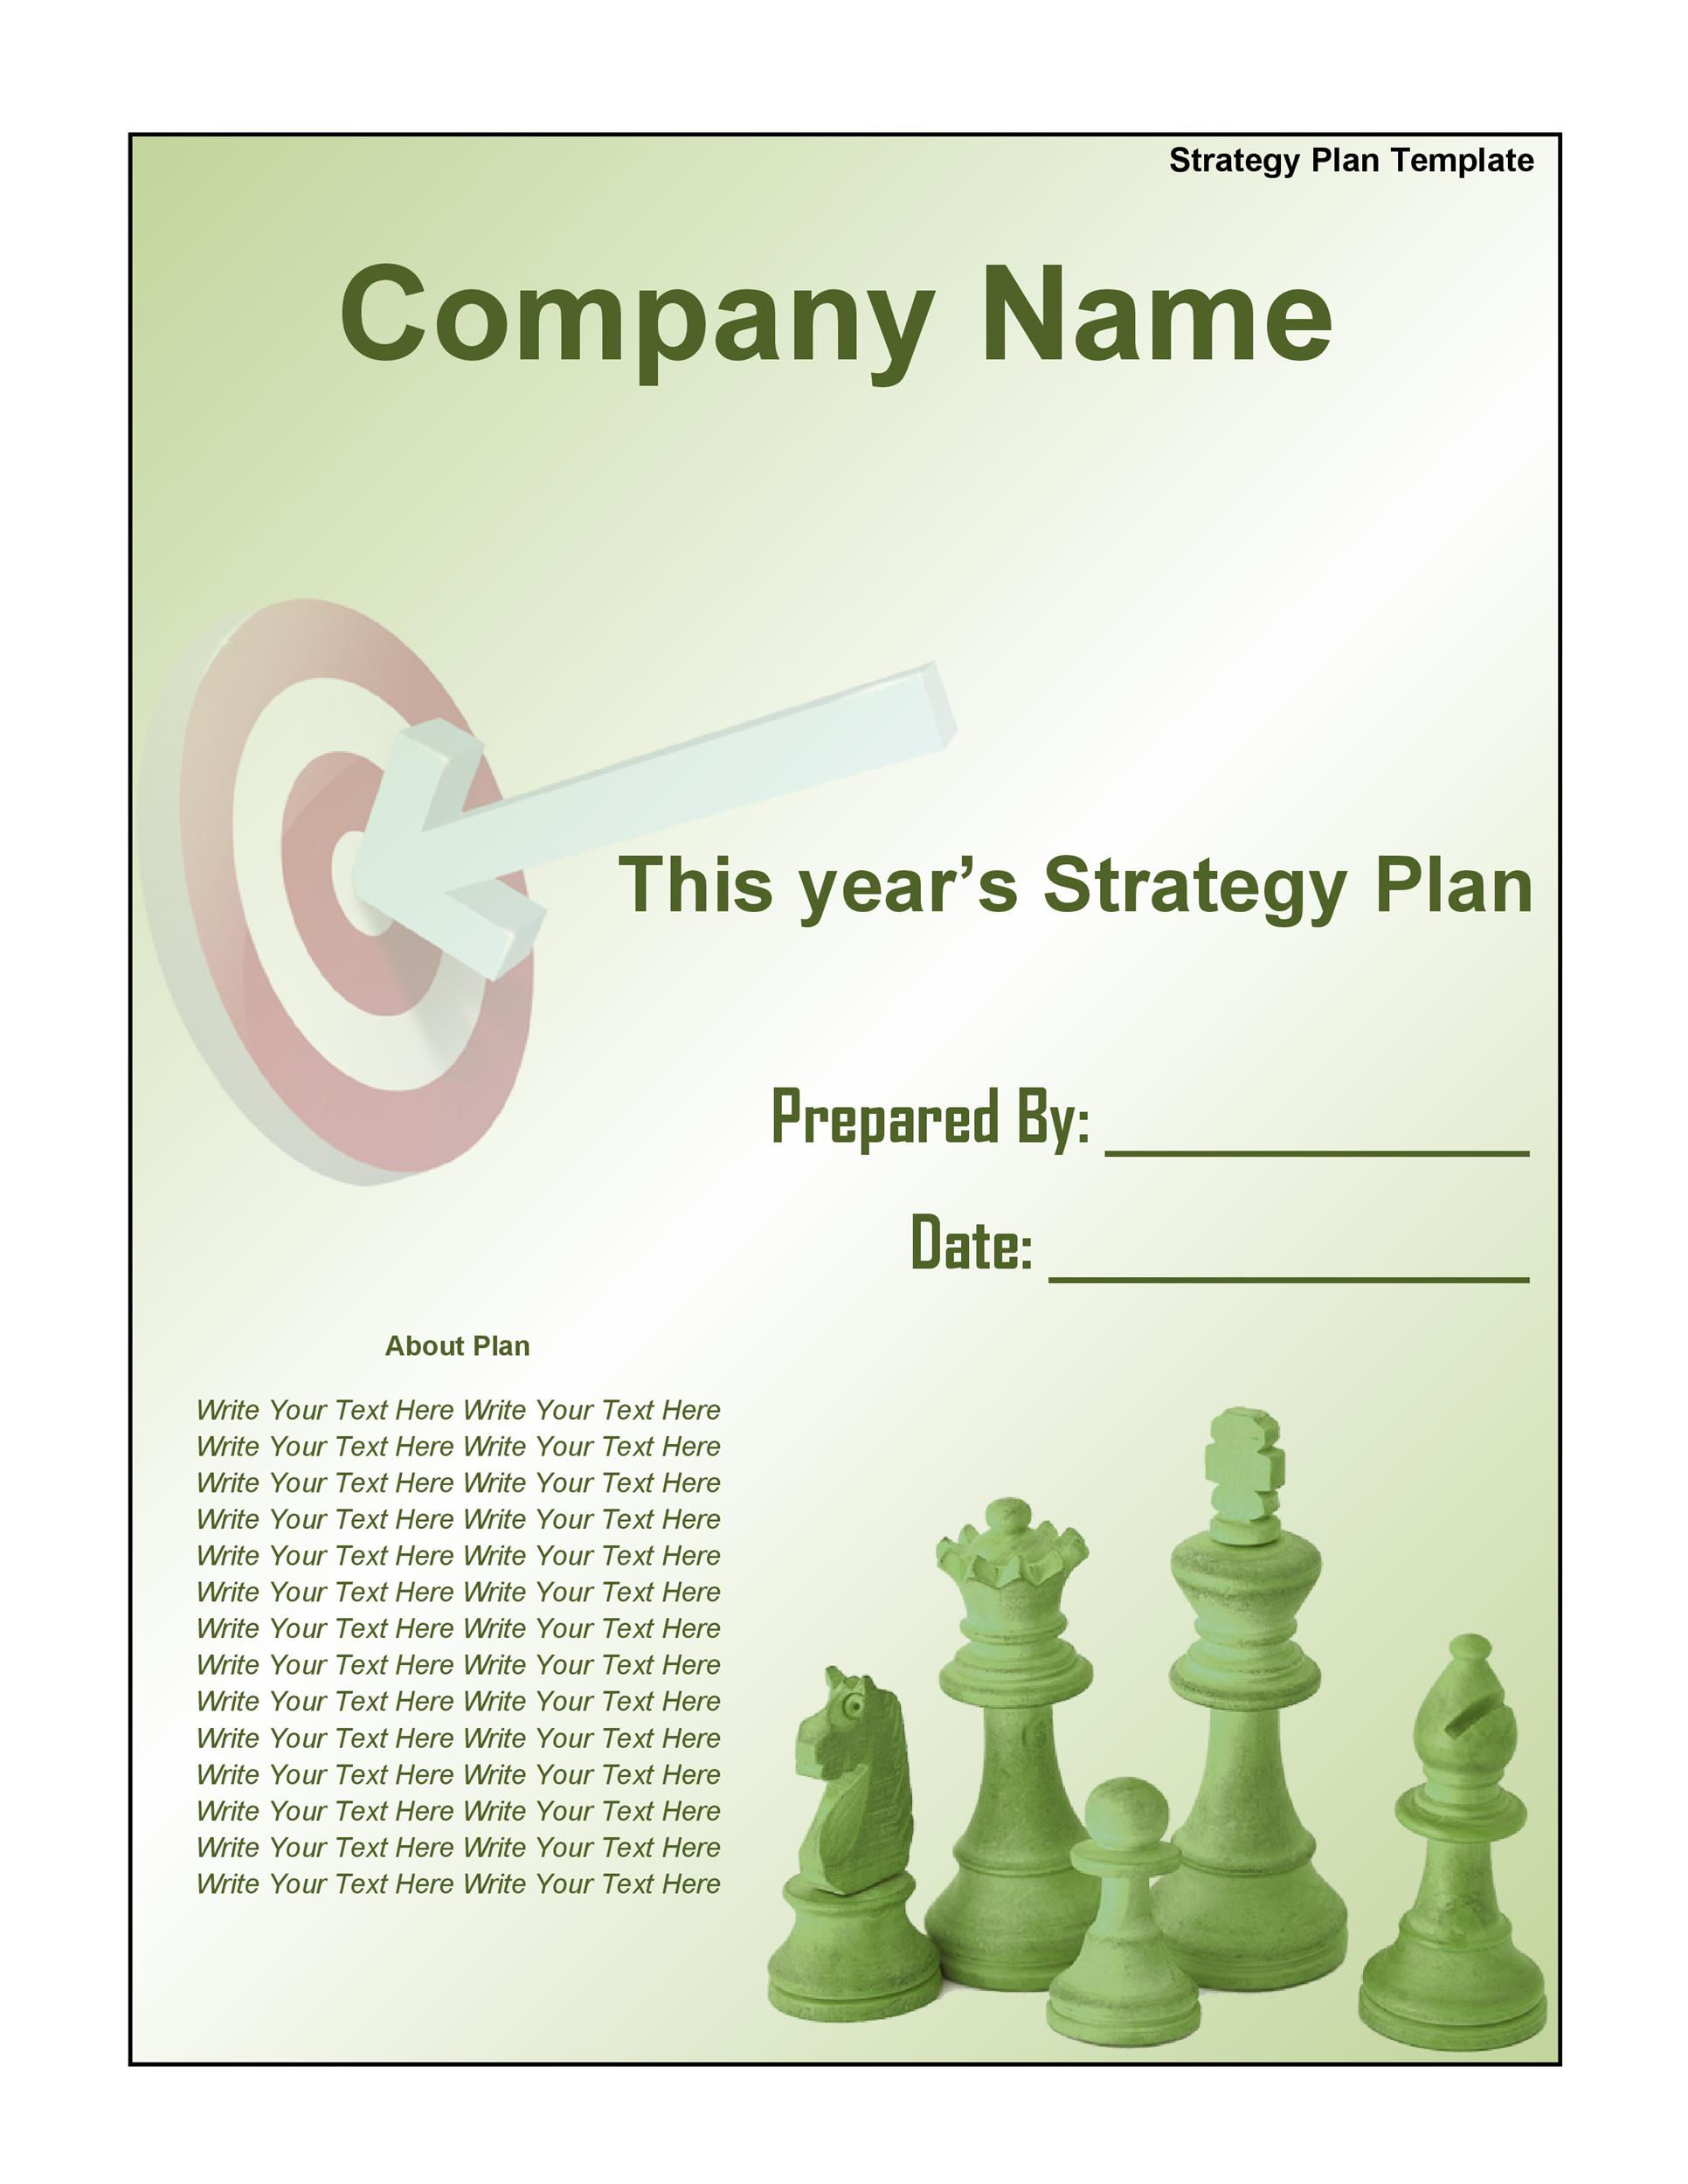 Free Strategic Plan Template 06